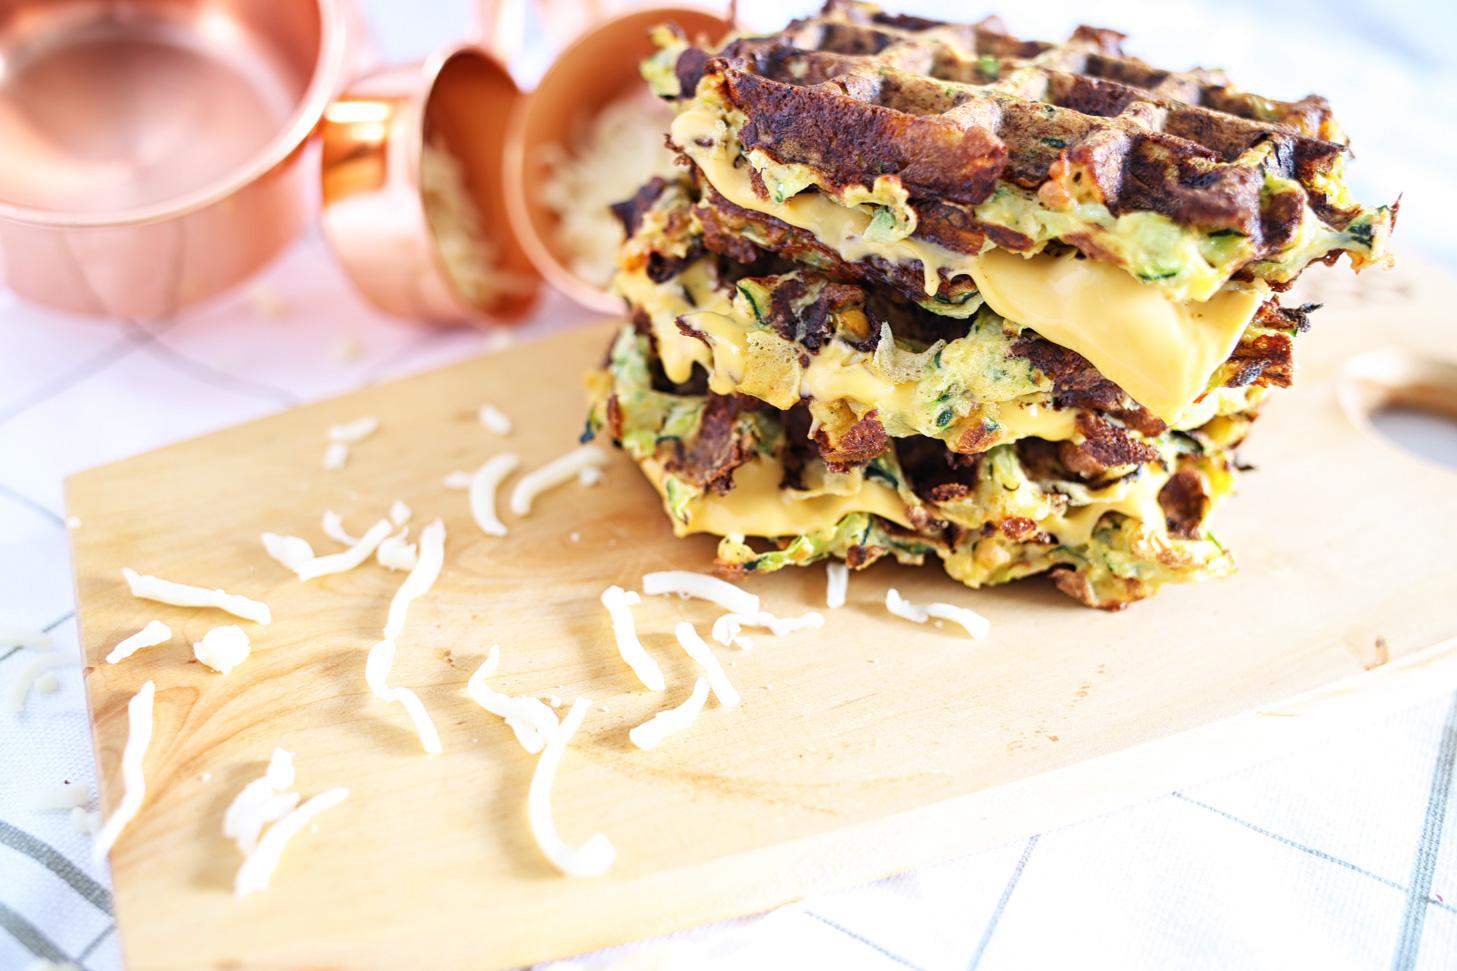 Zucchini-Käse-Sandwich-Waffel